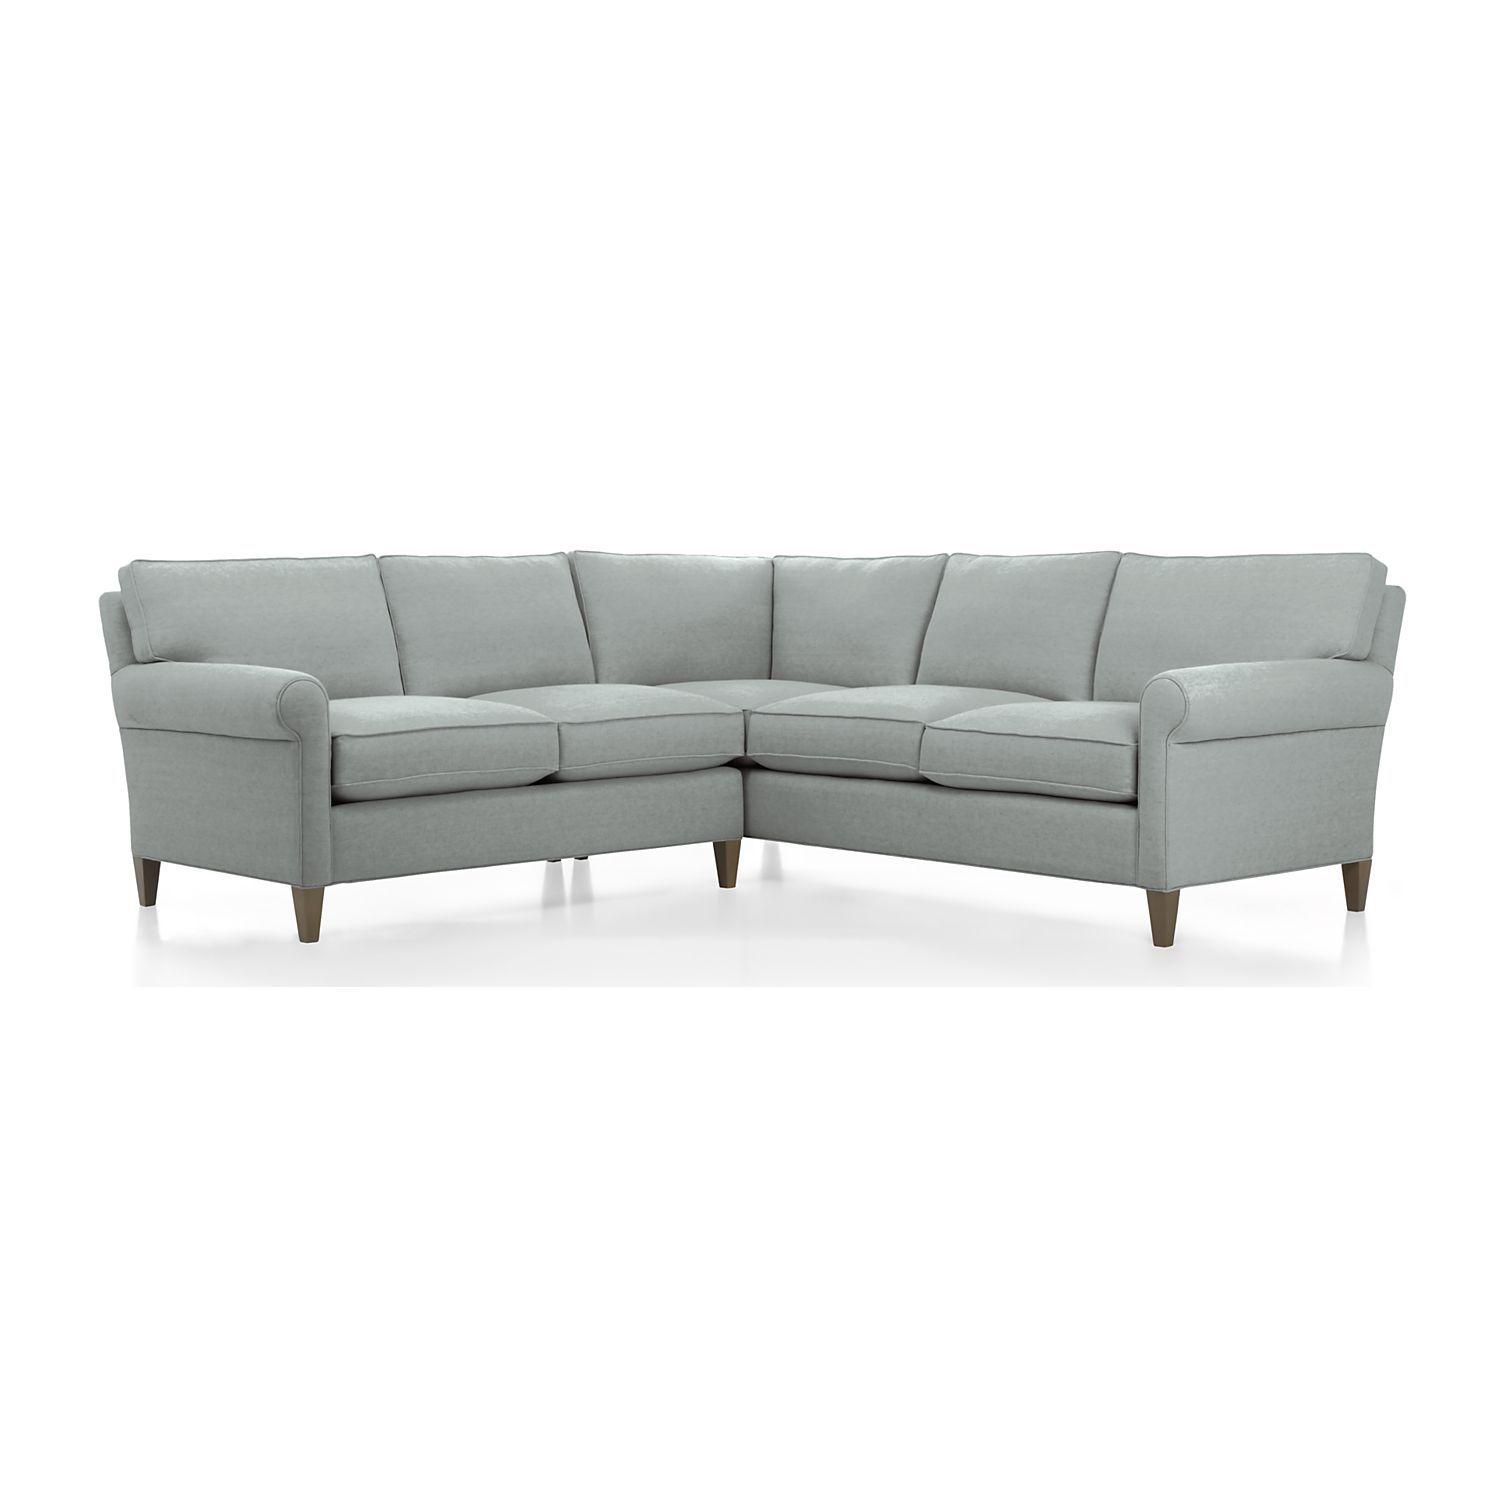 Montclair 2 piece sectional sofa ocean crate and barrel